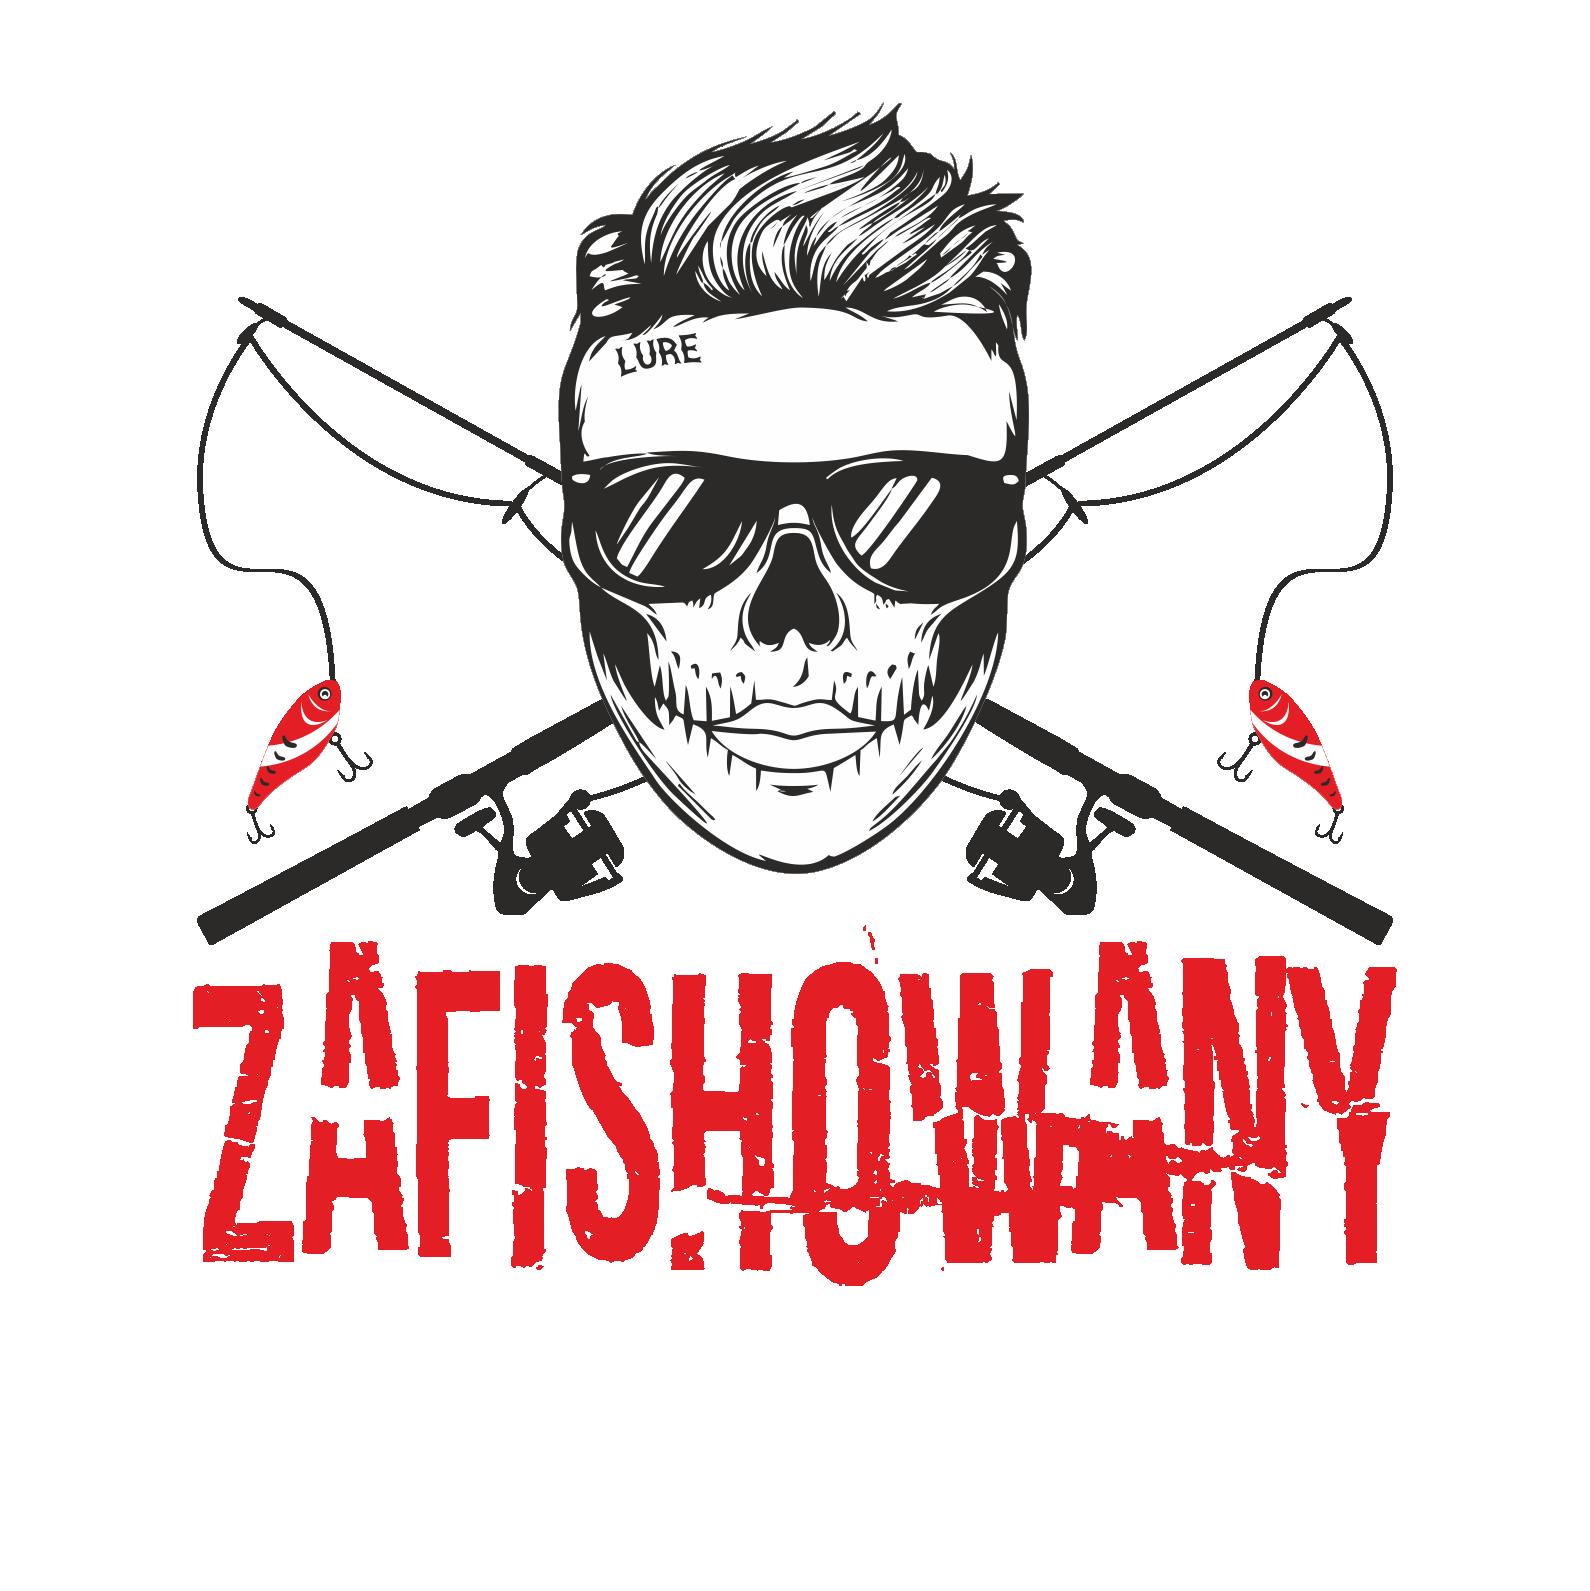 Zafishowany logo